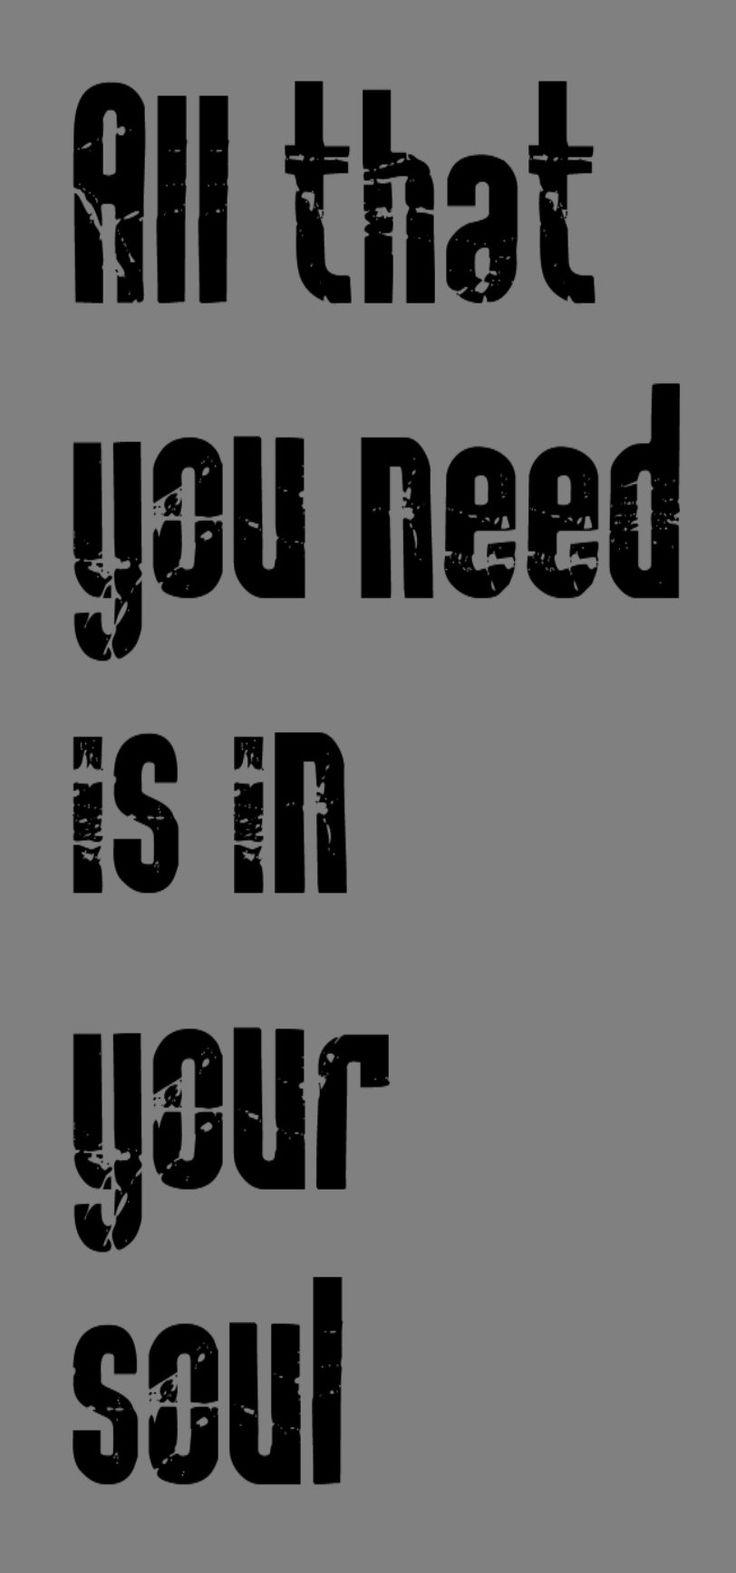 Lynyrd Skynyrd - Simple Man - song lyrics, music, quotes